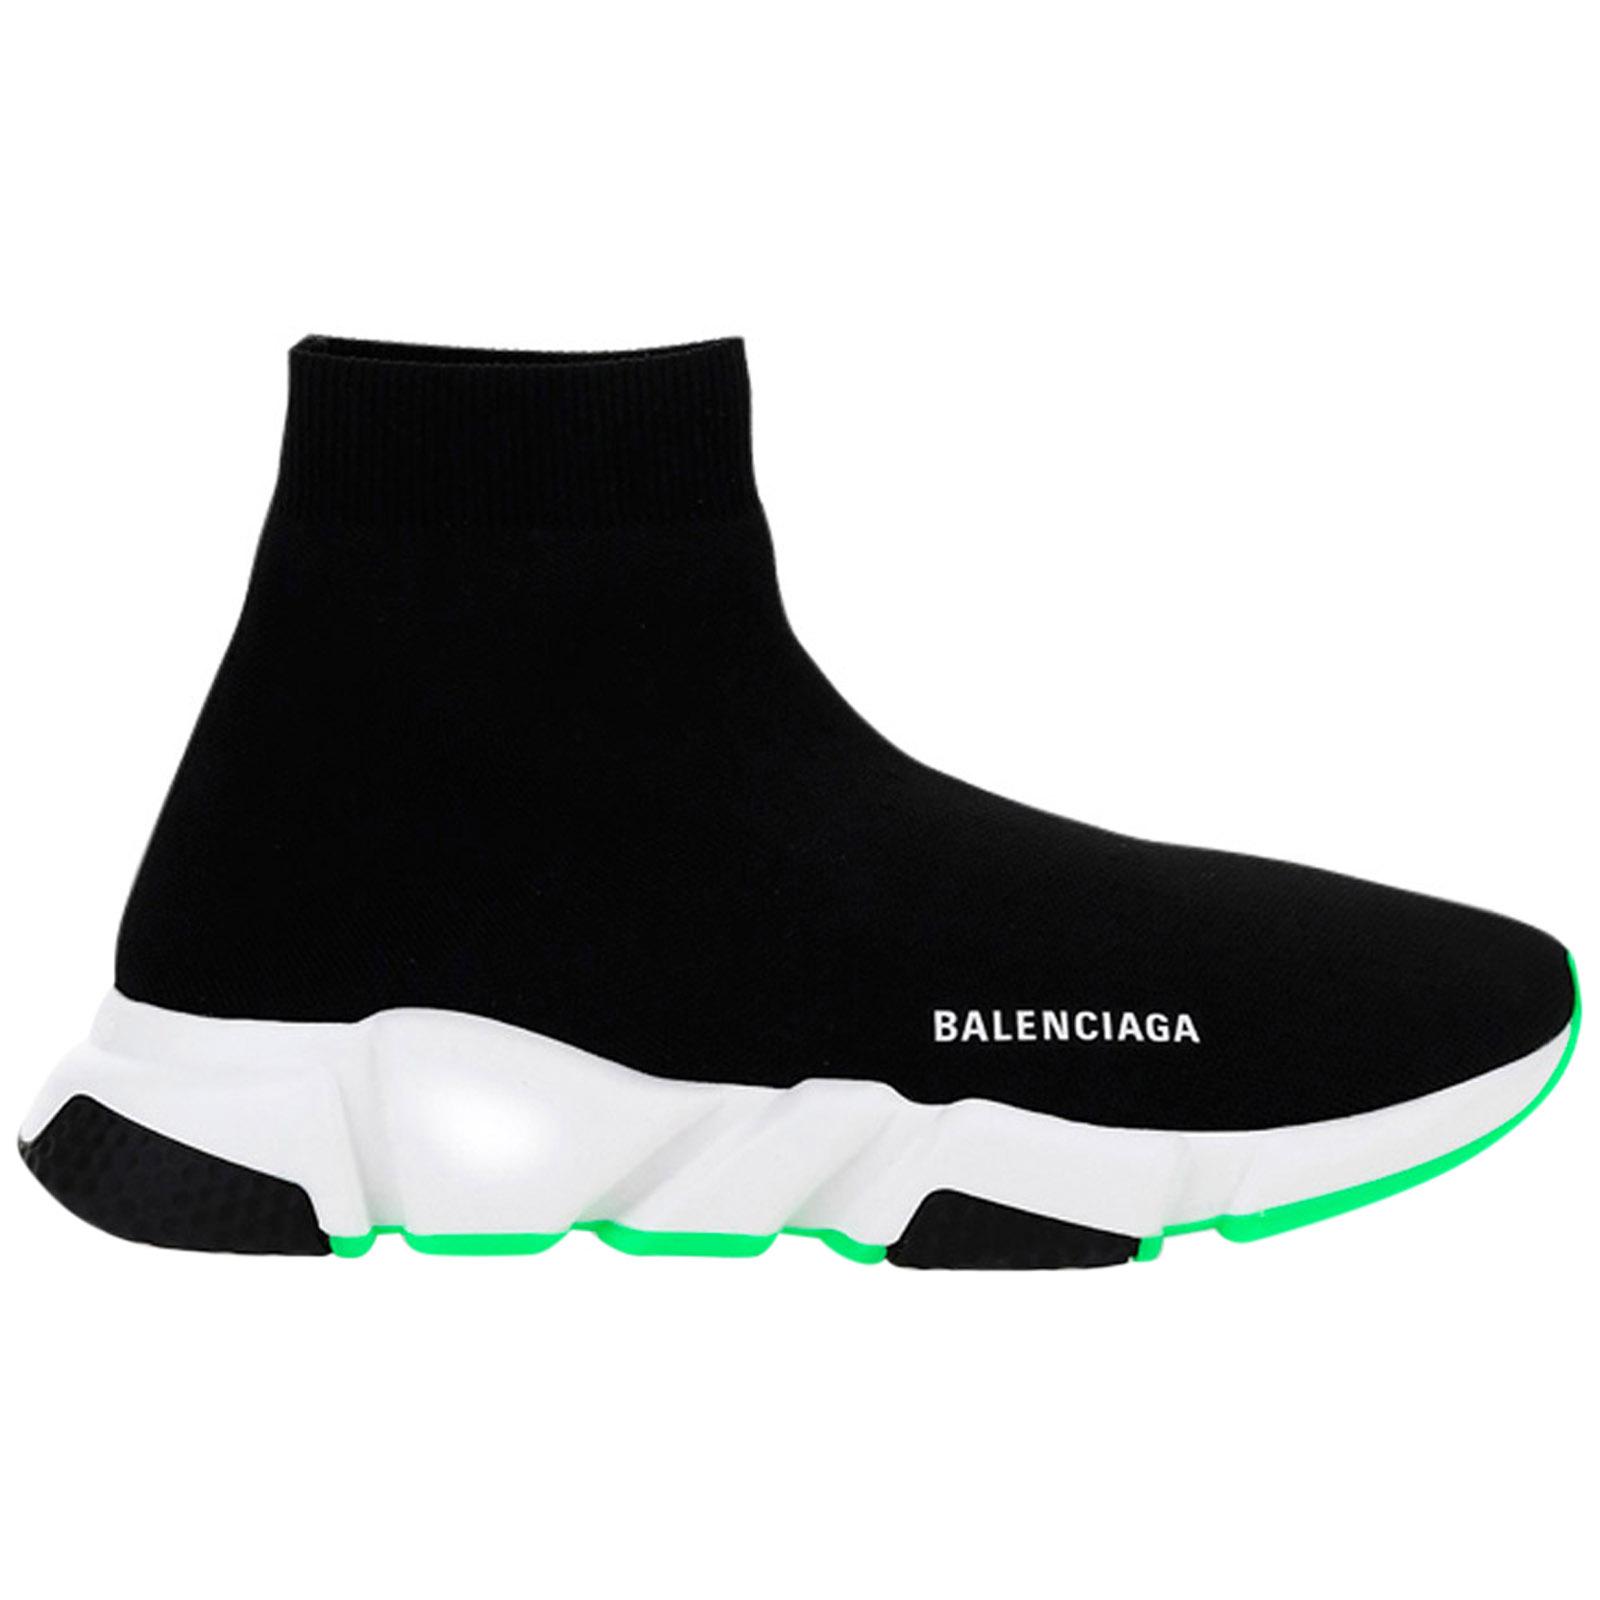 Balenciaga Sneakers MEN'S SLIP ON SNEAKERS SPEED